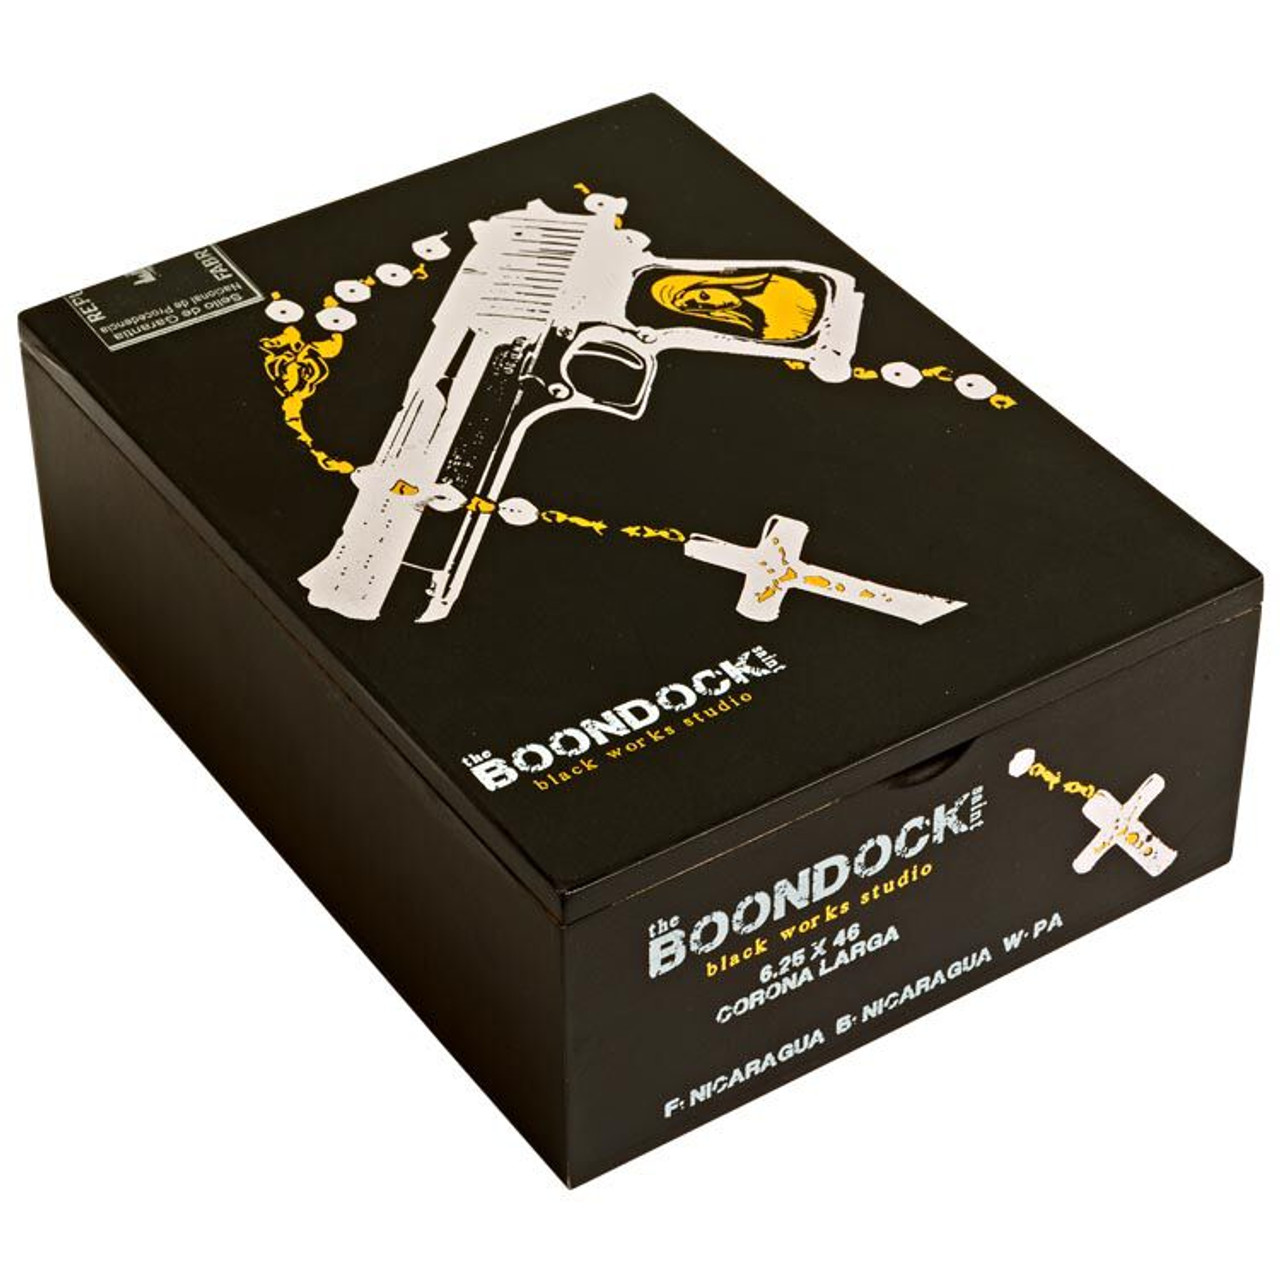 Black Works Studio Sindustry Robusto Cigars - 5 x 50 (Box of 20)